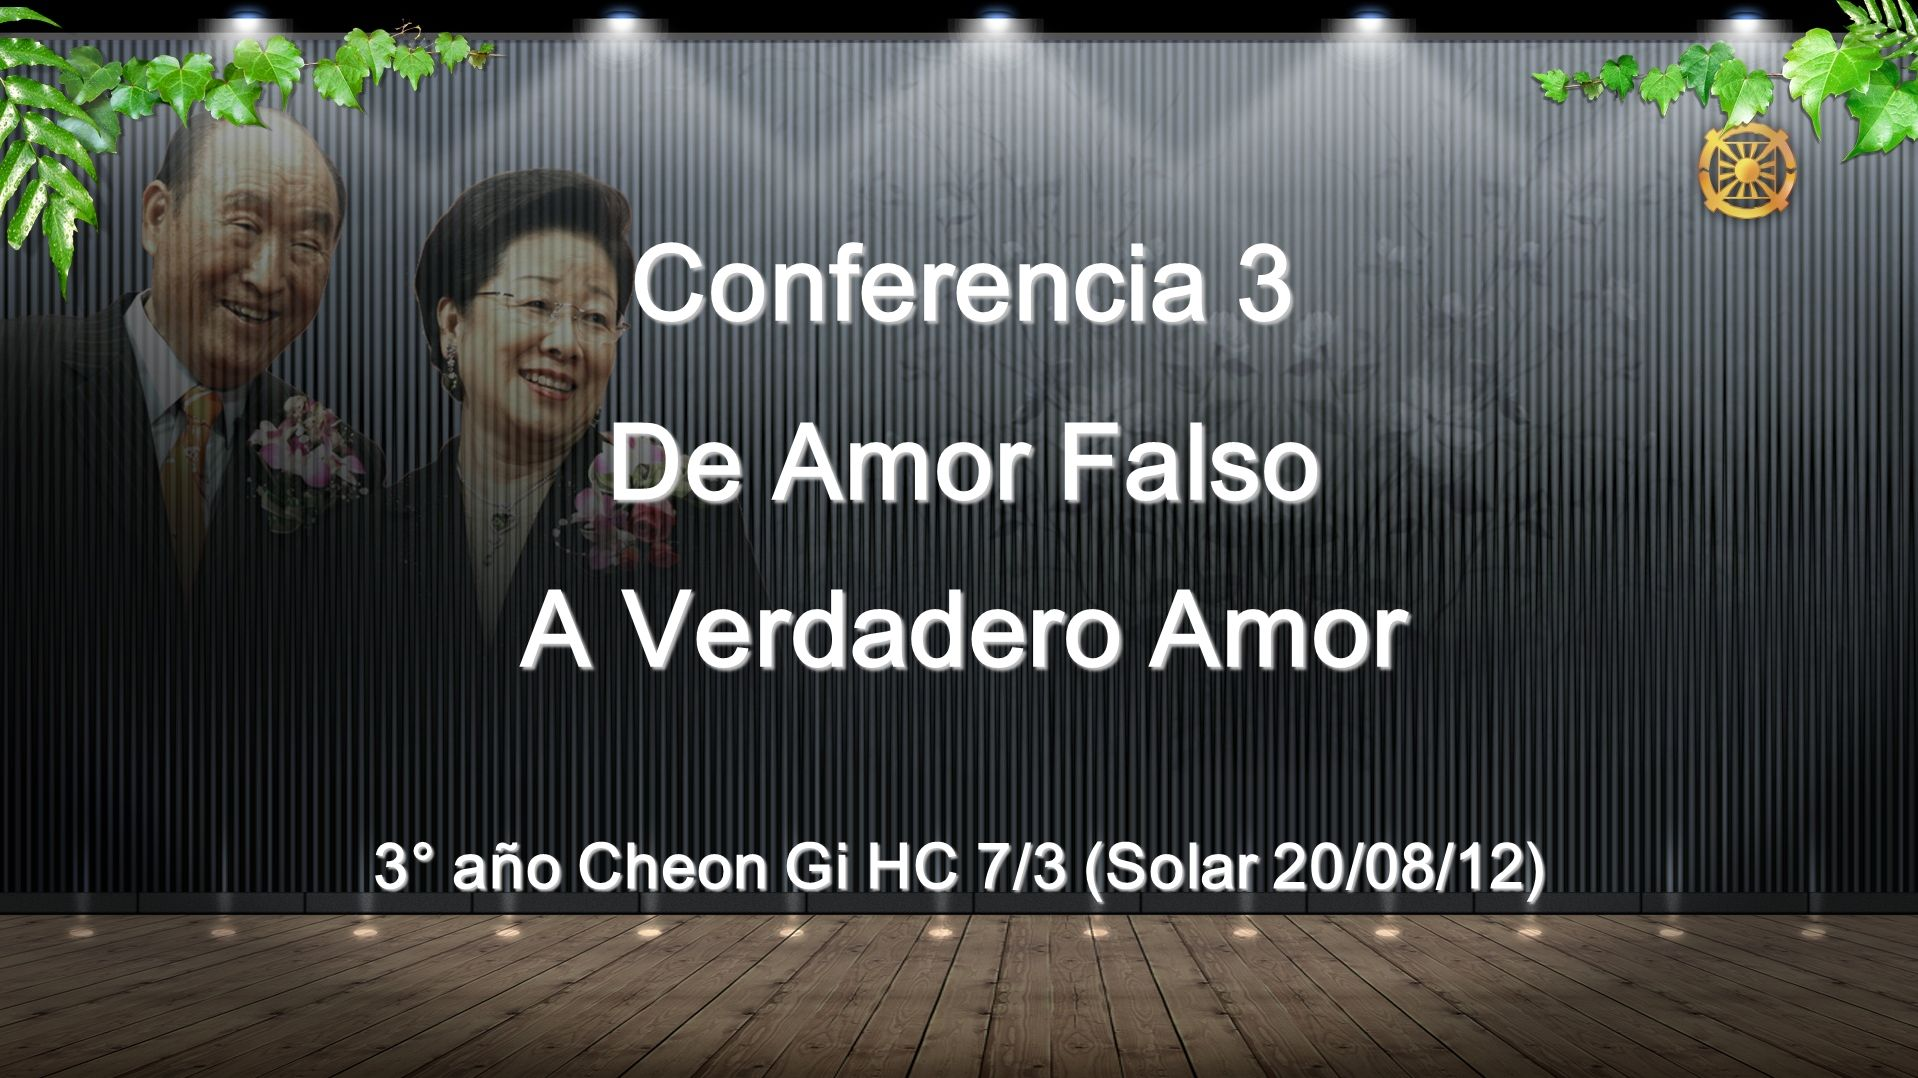 3° año Cheon Gi HC 7/3 (Solar 20/08/12)